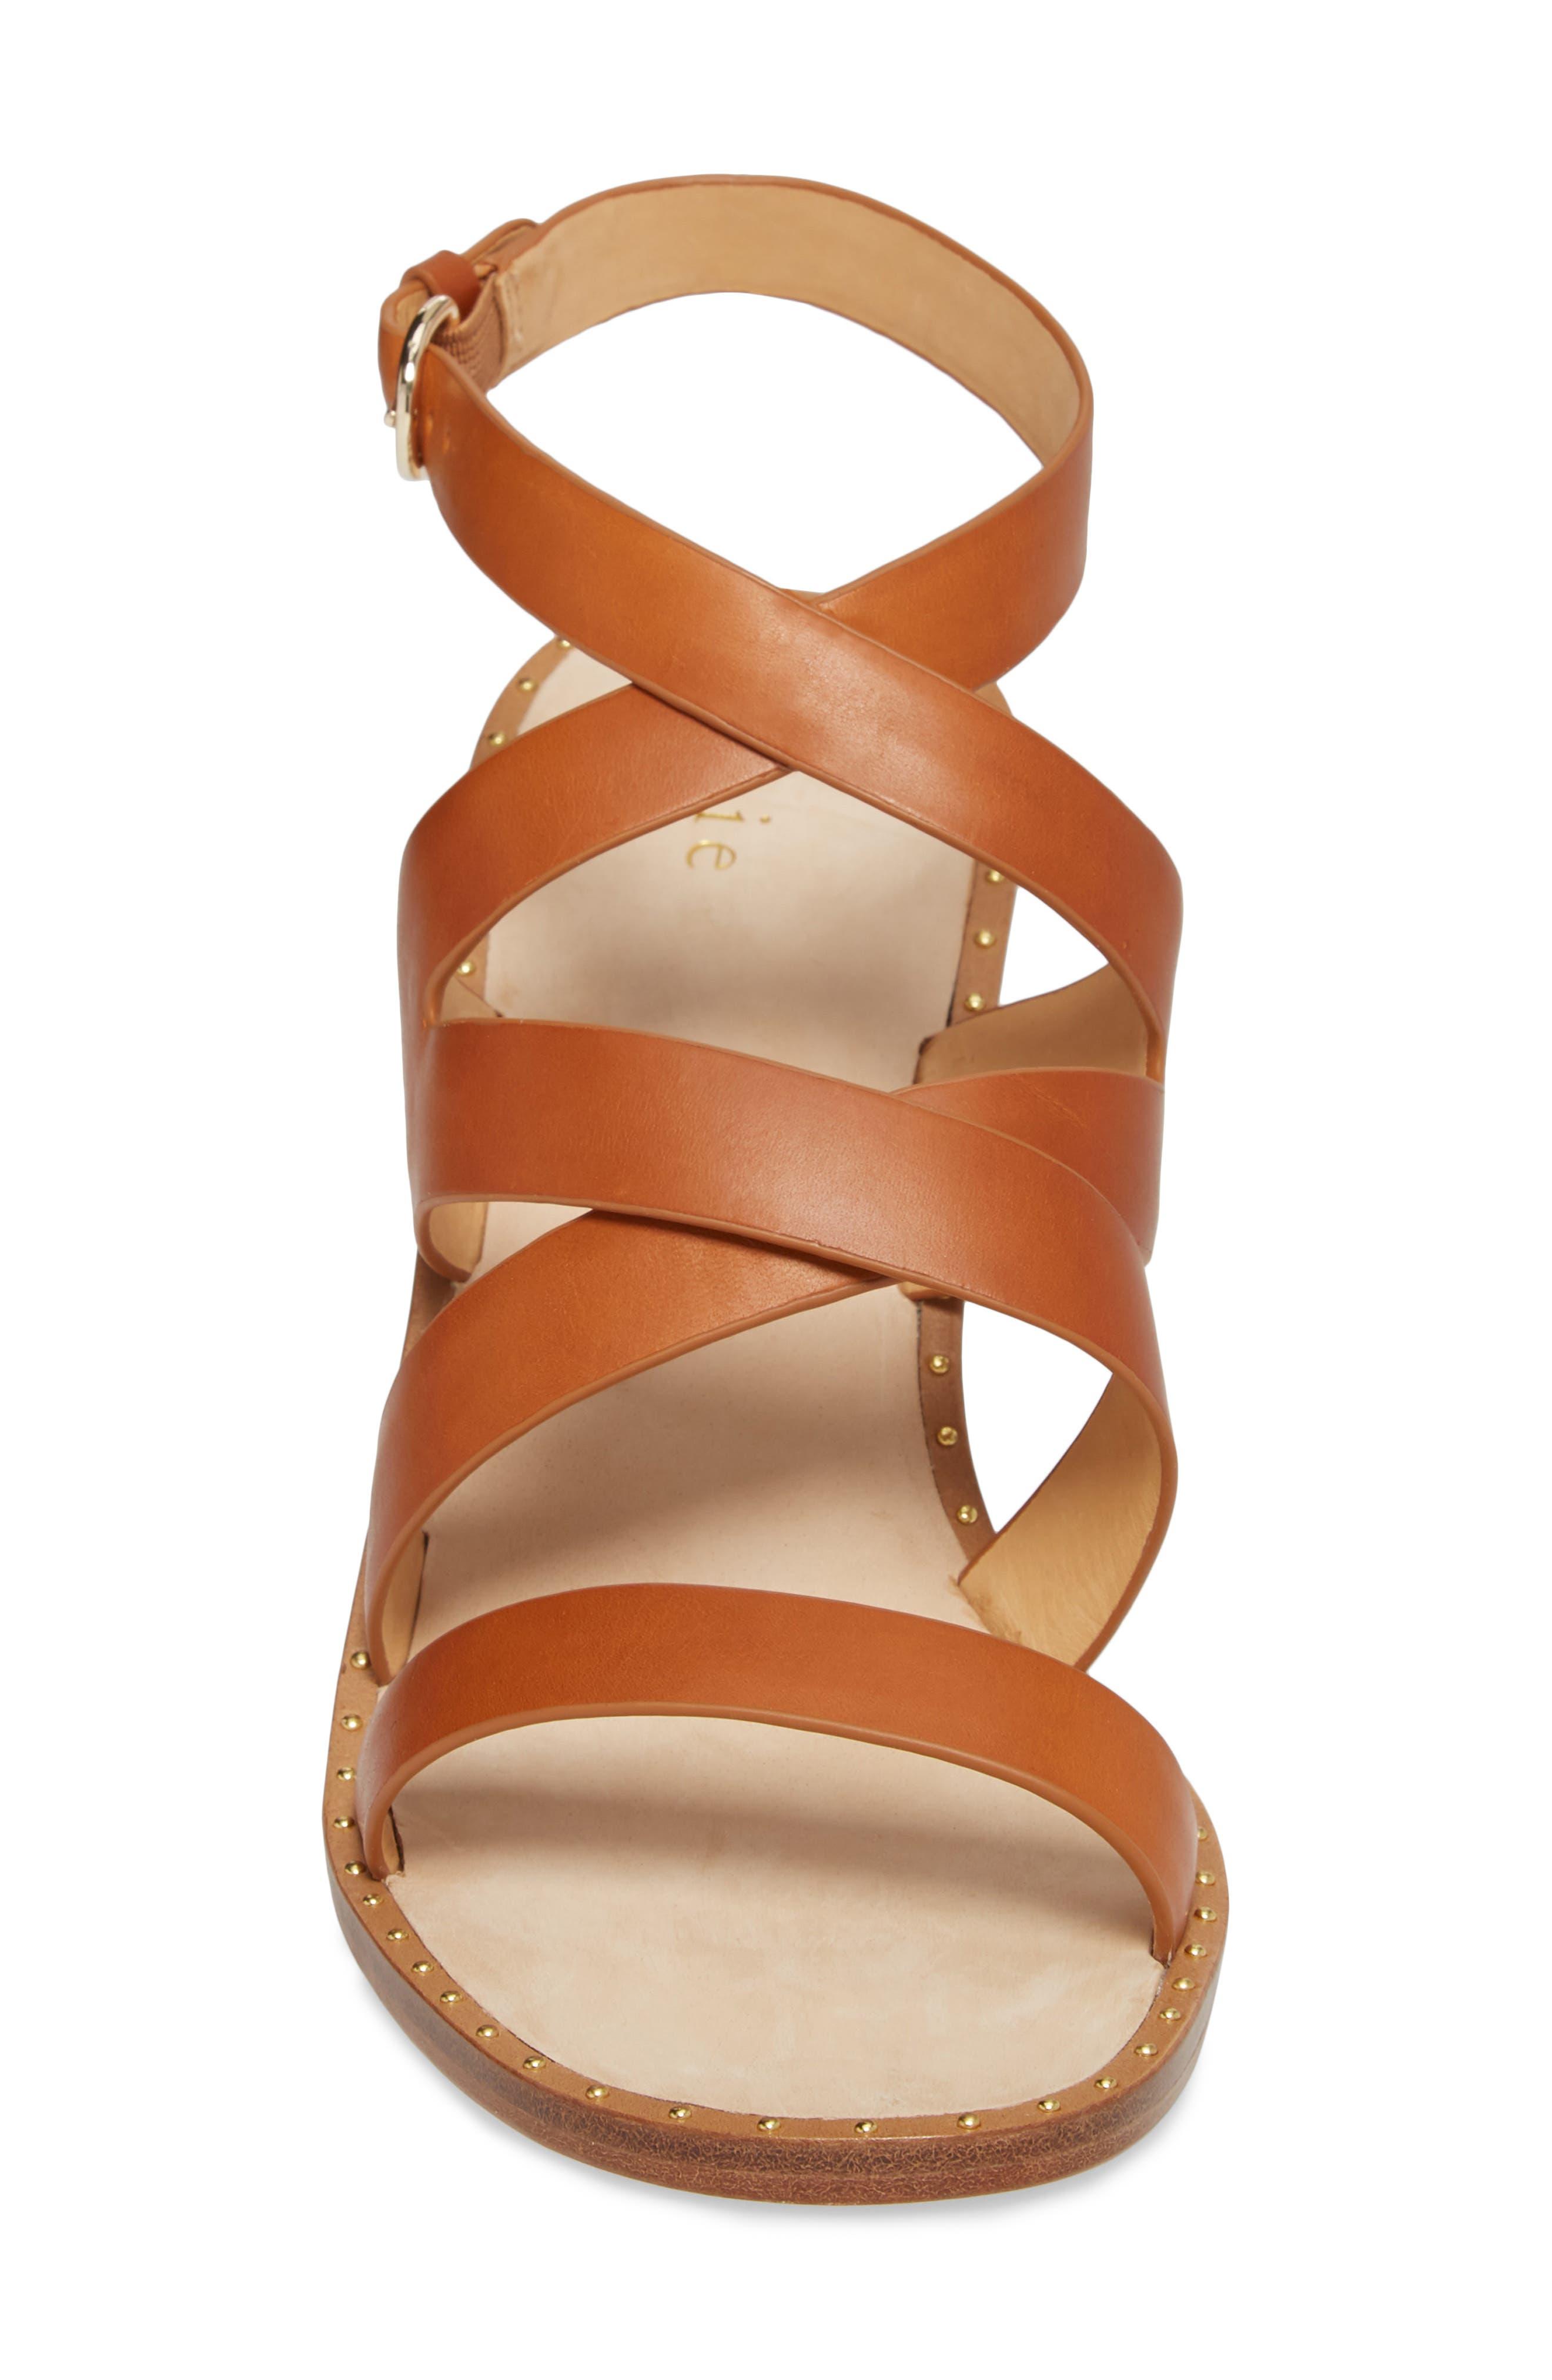 Onfer Studded Strappy Sandal,                             Alternate thumbnail 4, color,                             Tan